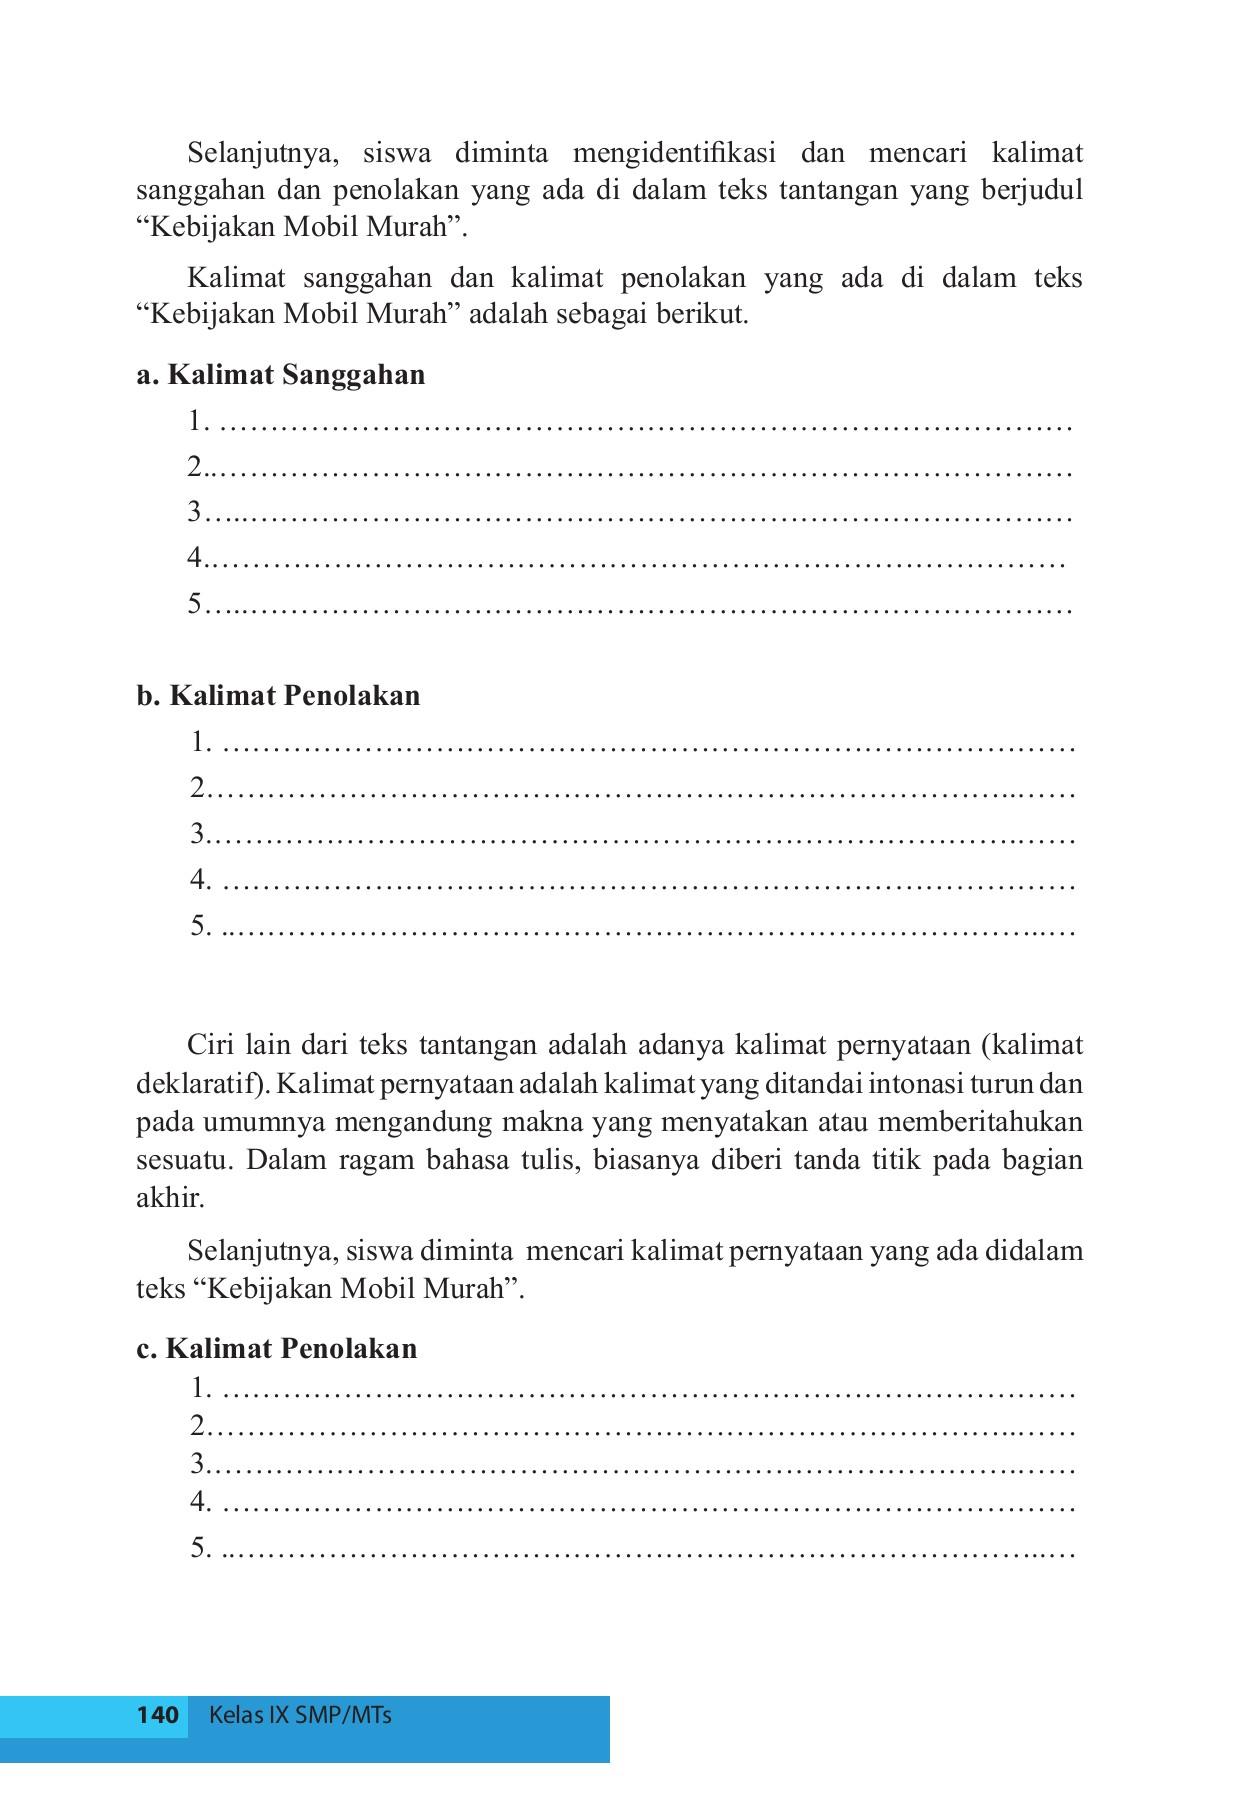 Menyusun Teks Tantangan Hukuman Mati Bagi Pengedar Narkoba : menyusun, tantangan, hukuman, pengedar, narkoba, Menyusun, Tantangan, Hukuman, Pengedar, Narkoba, Mudah